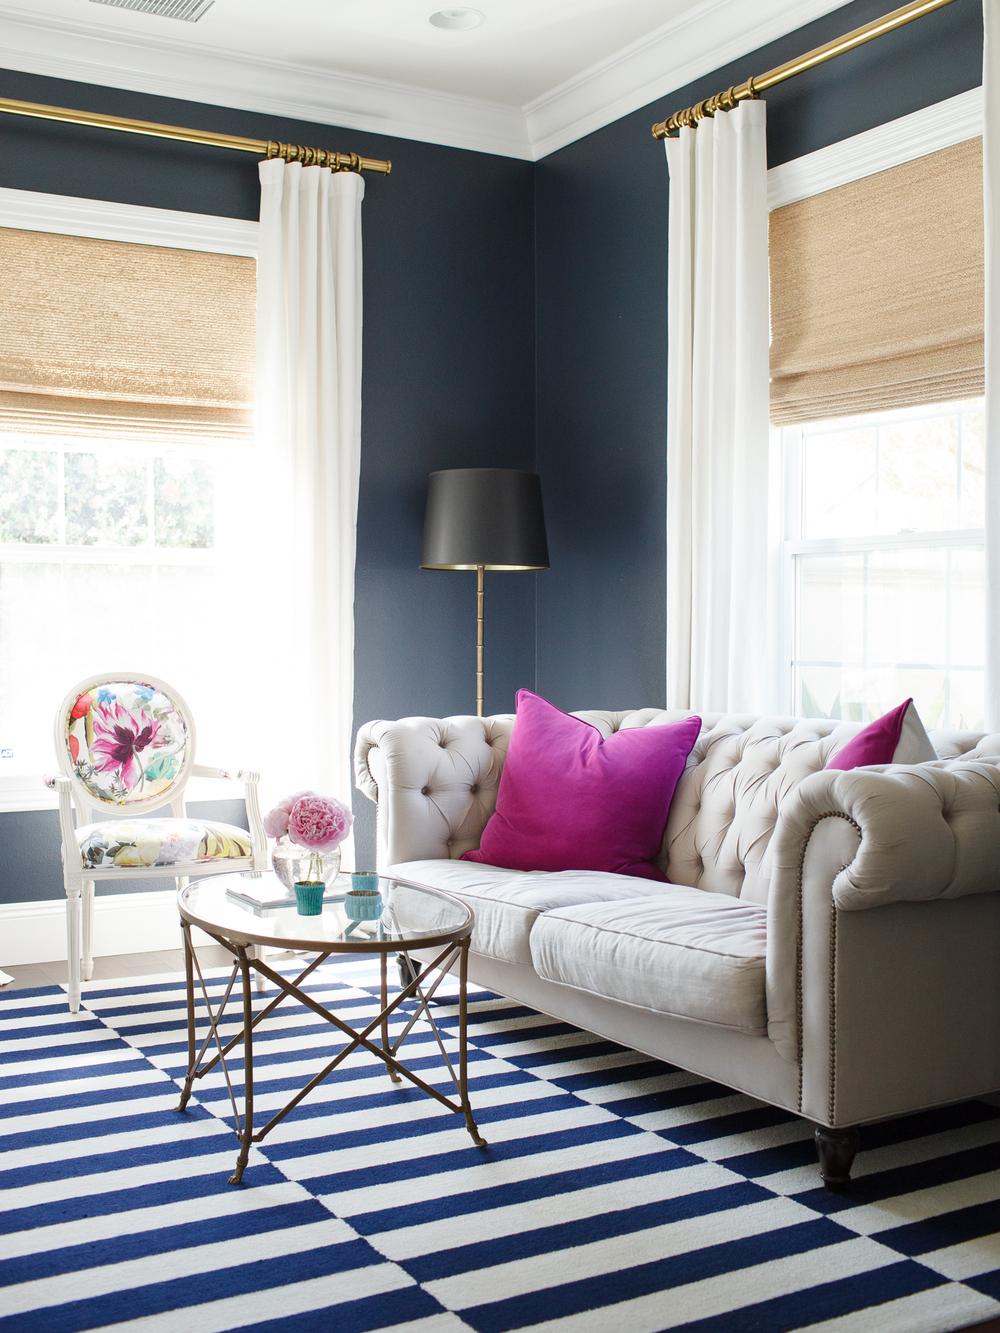 7 essential interior design tricks that will make you a pro